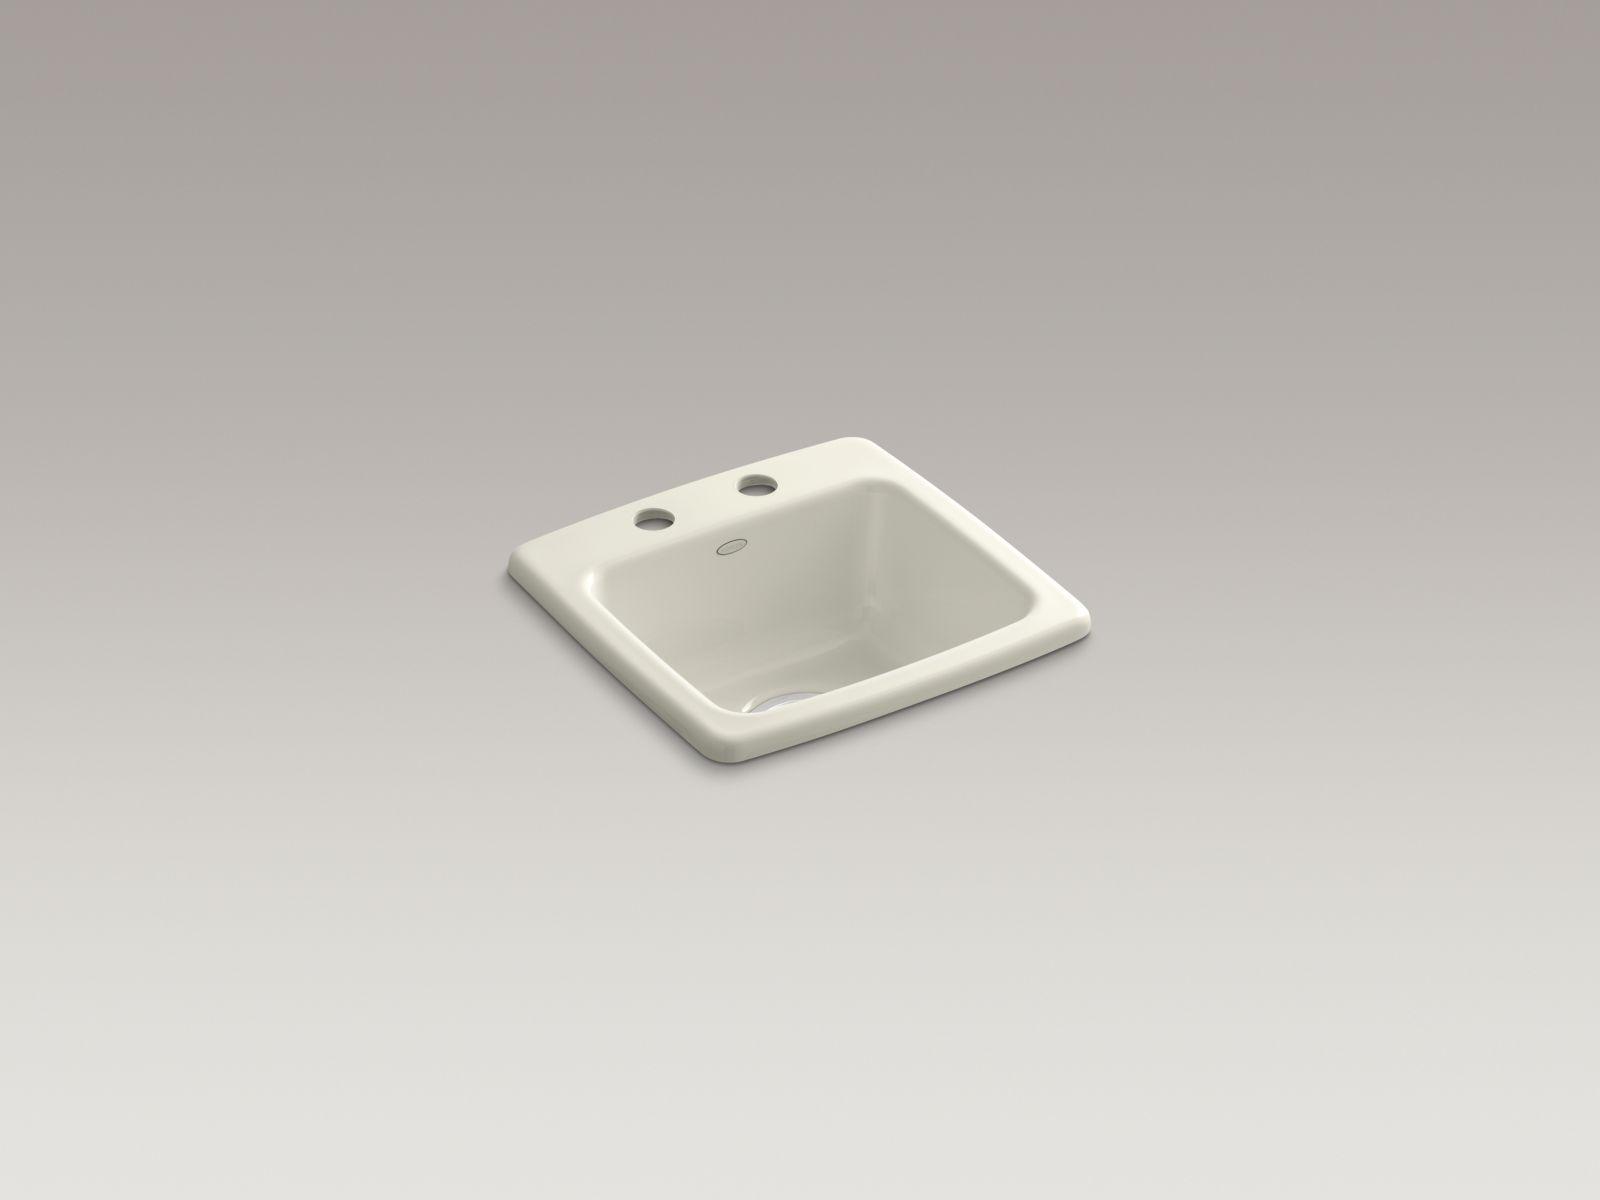 Kohler K-6015-2-96 Gimlet Self-rimming Single-bowl Bar Sink with 2 Faucet Holes Biscuit